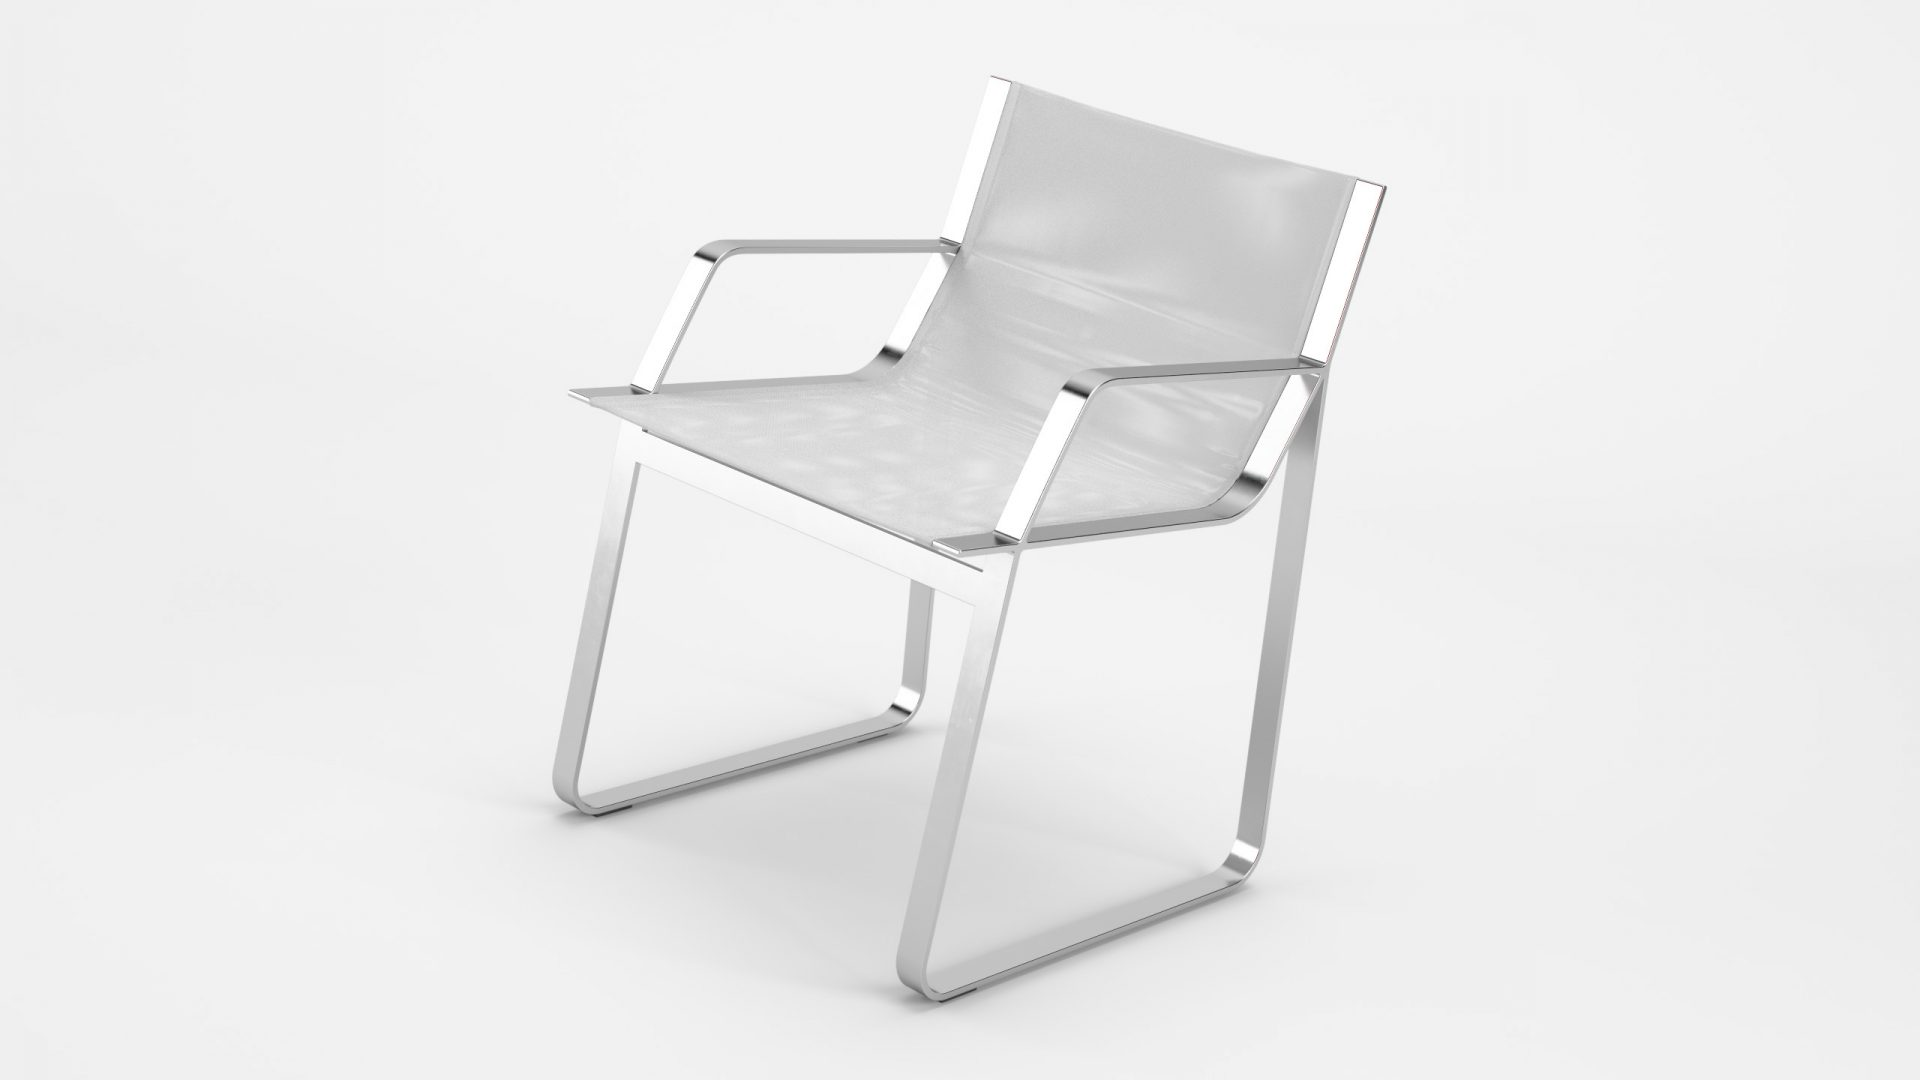 008_Essentiel_Chair_0711E2_WhiteSet_01_0003